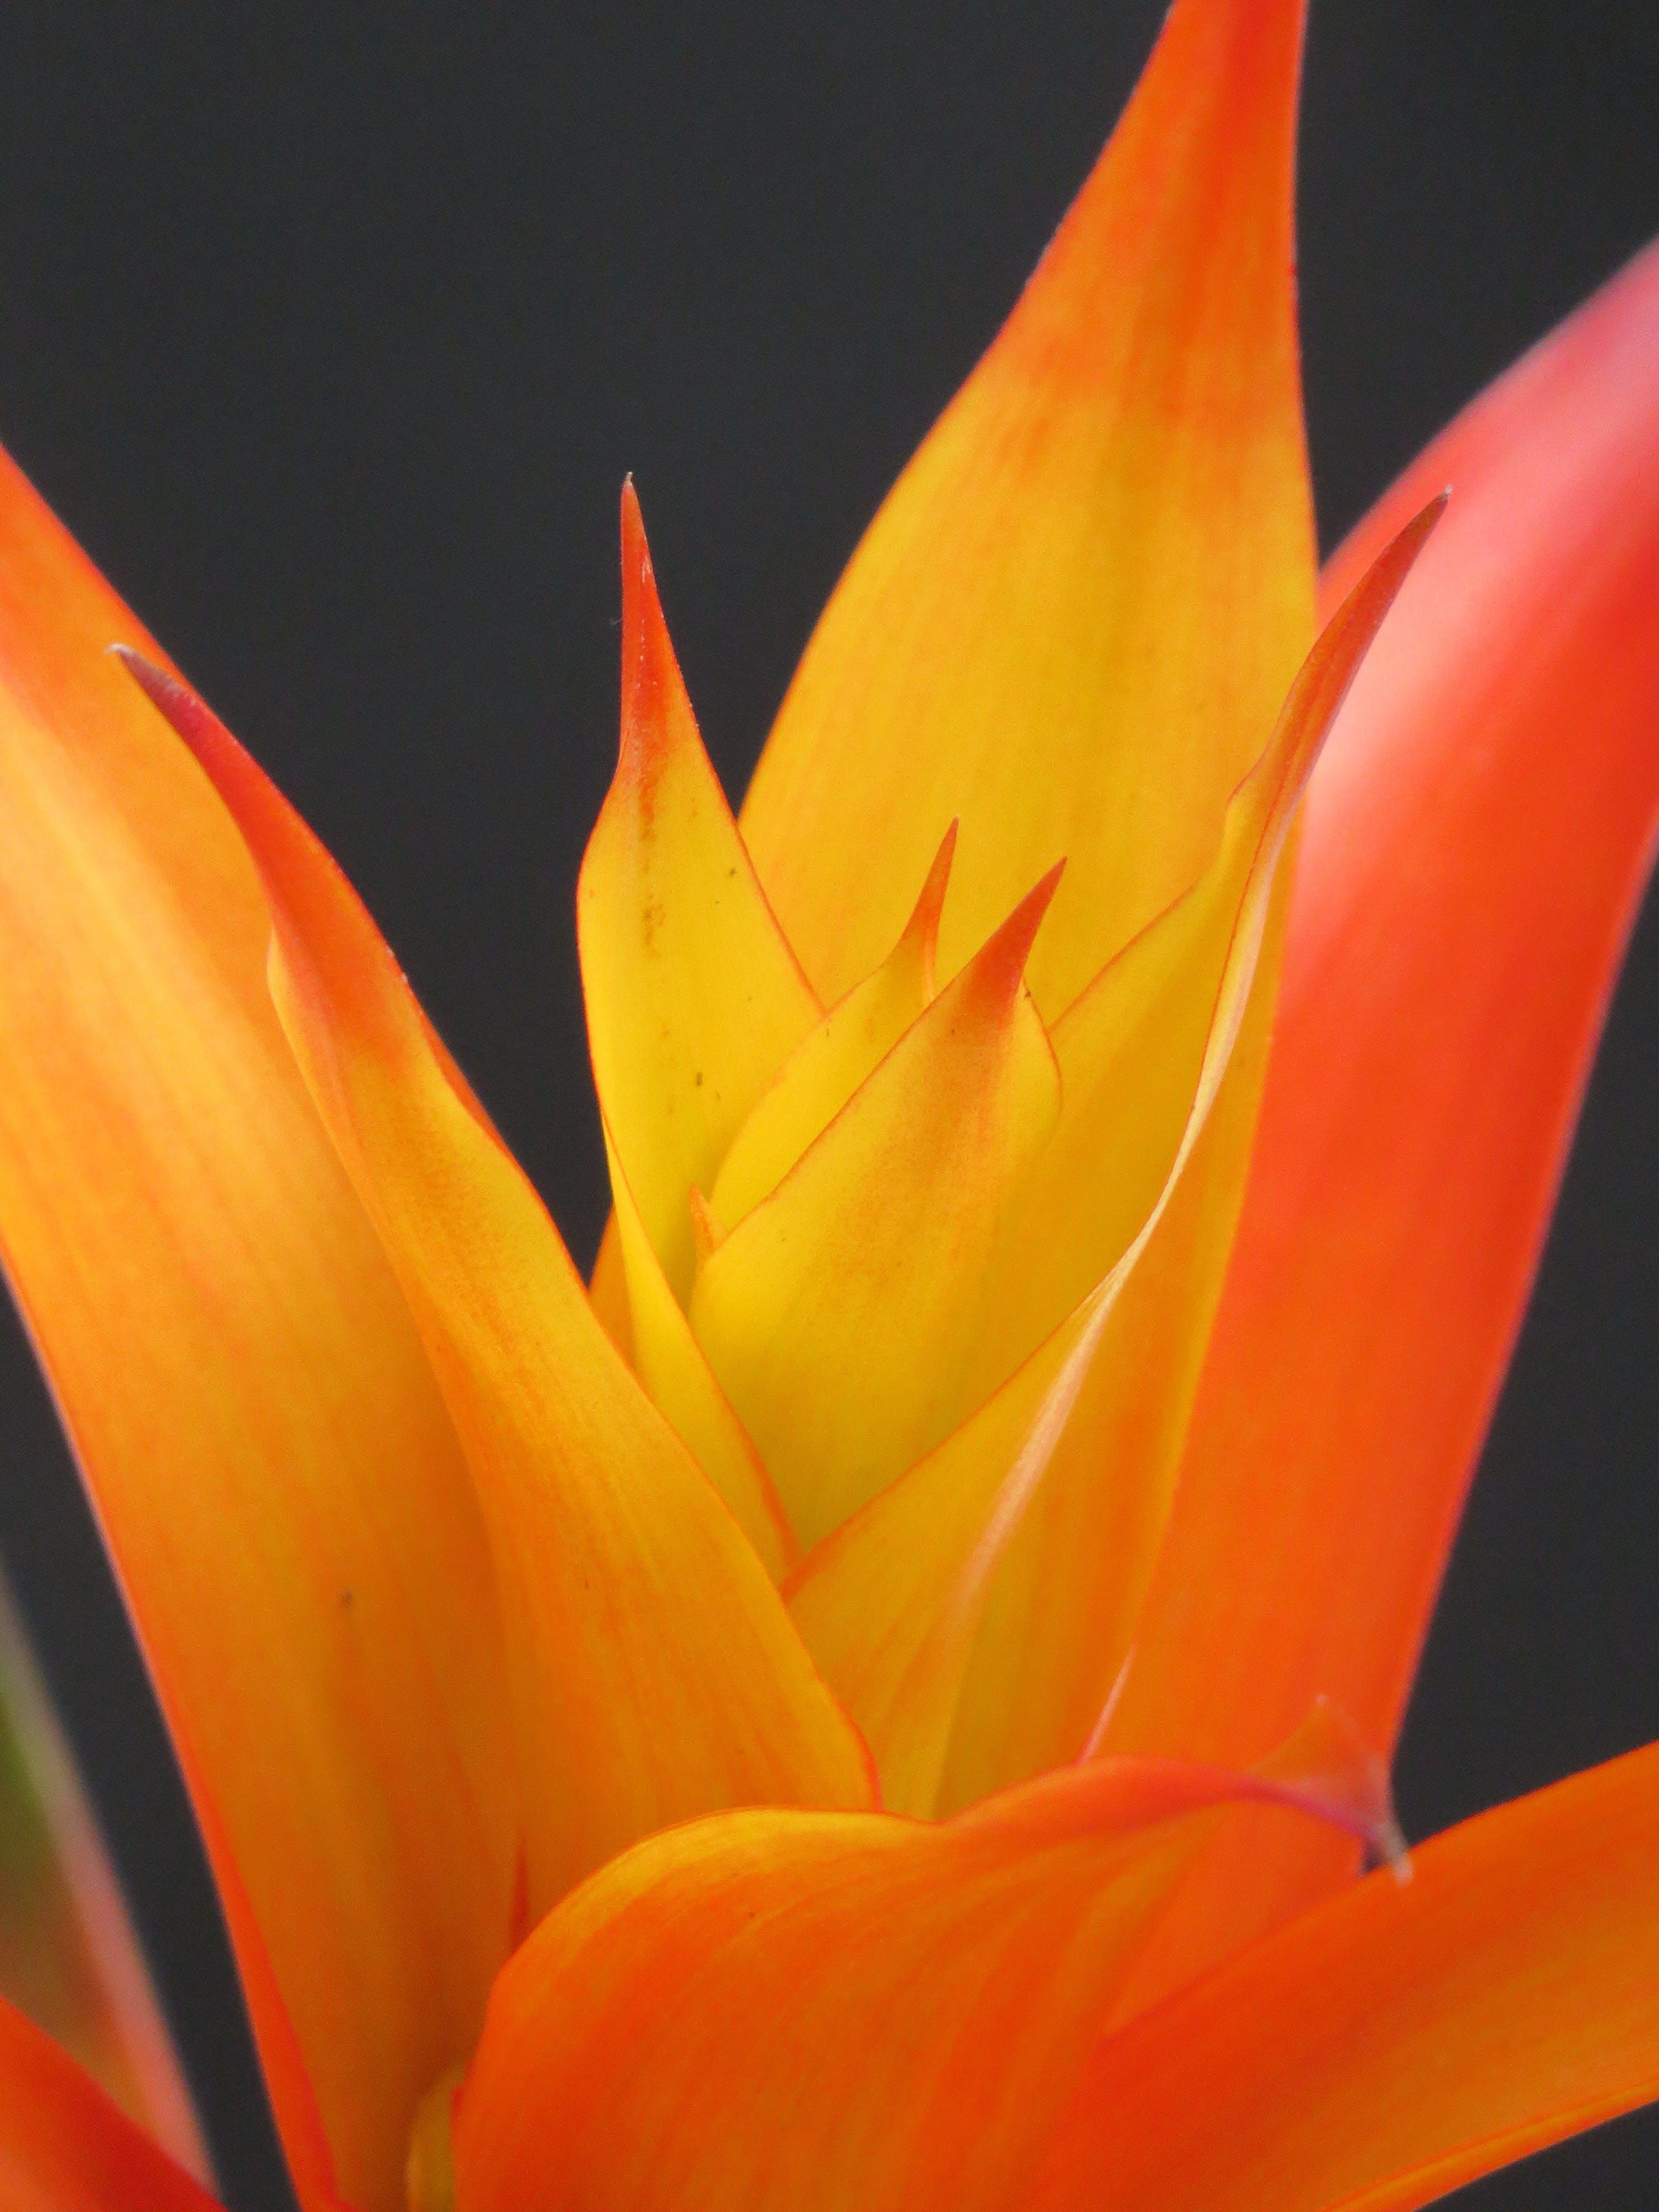 Orange and Yellow Petal Flower